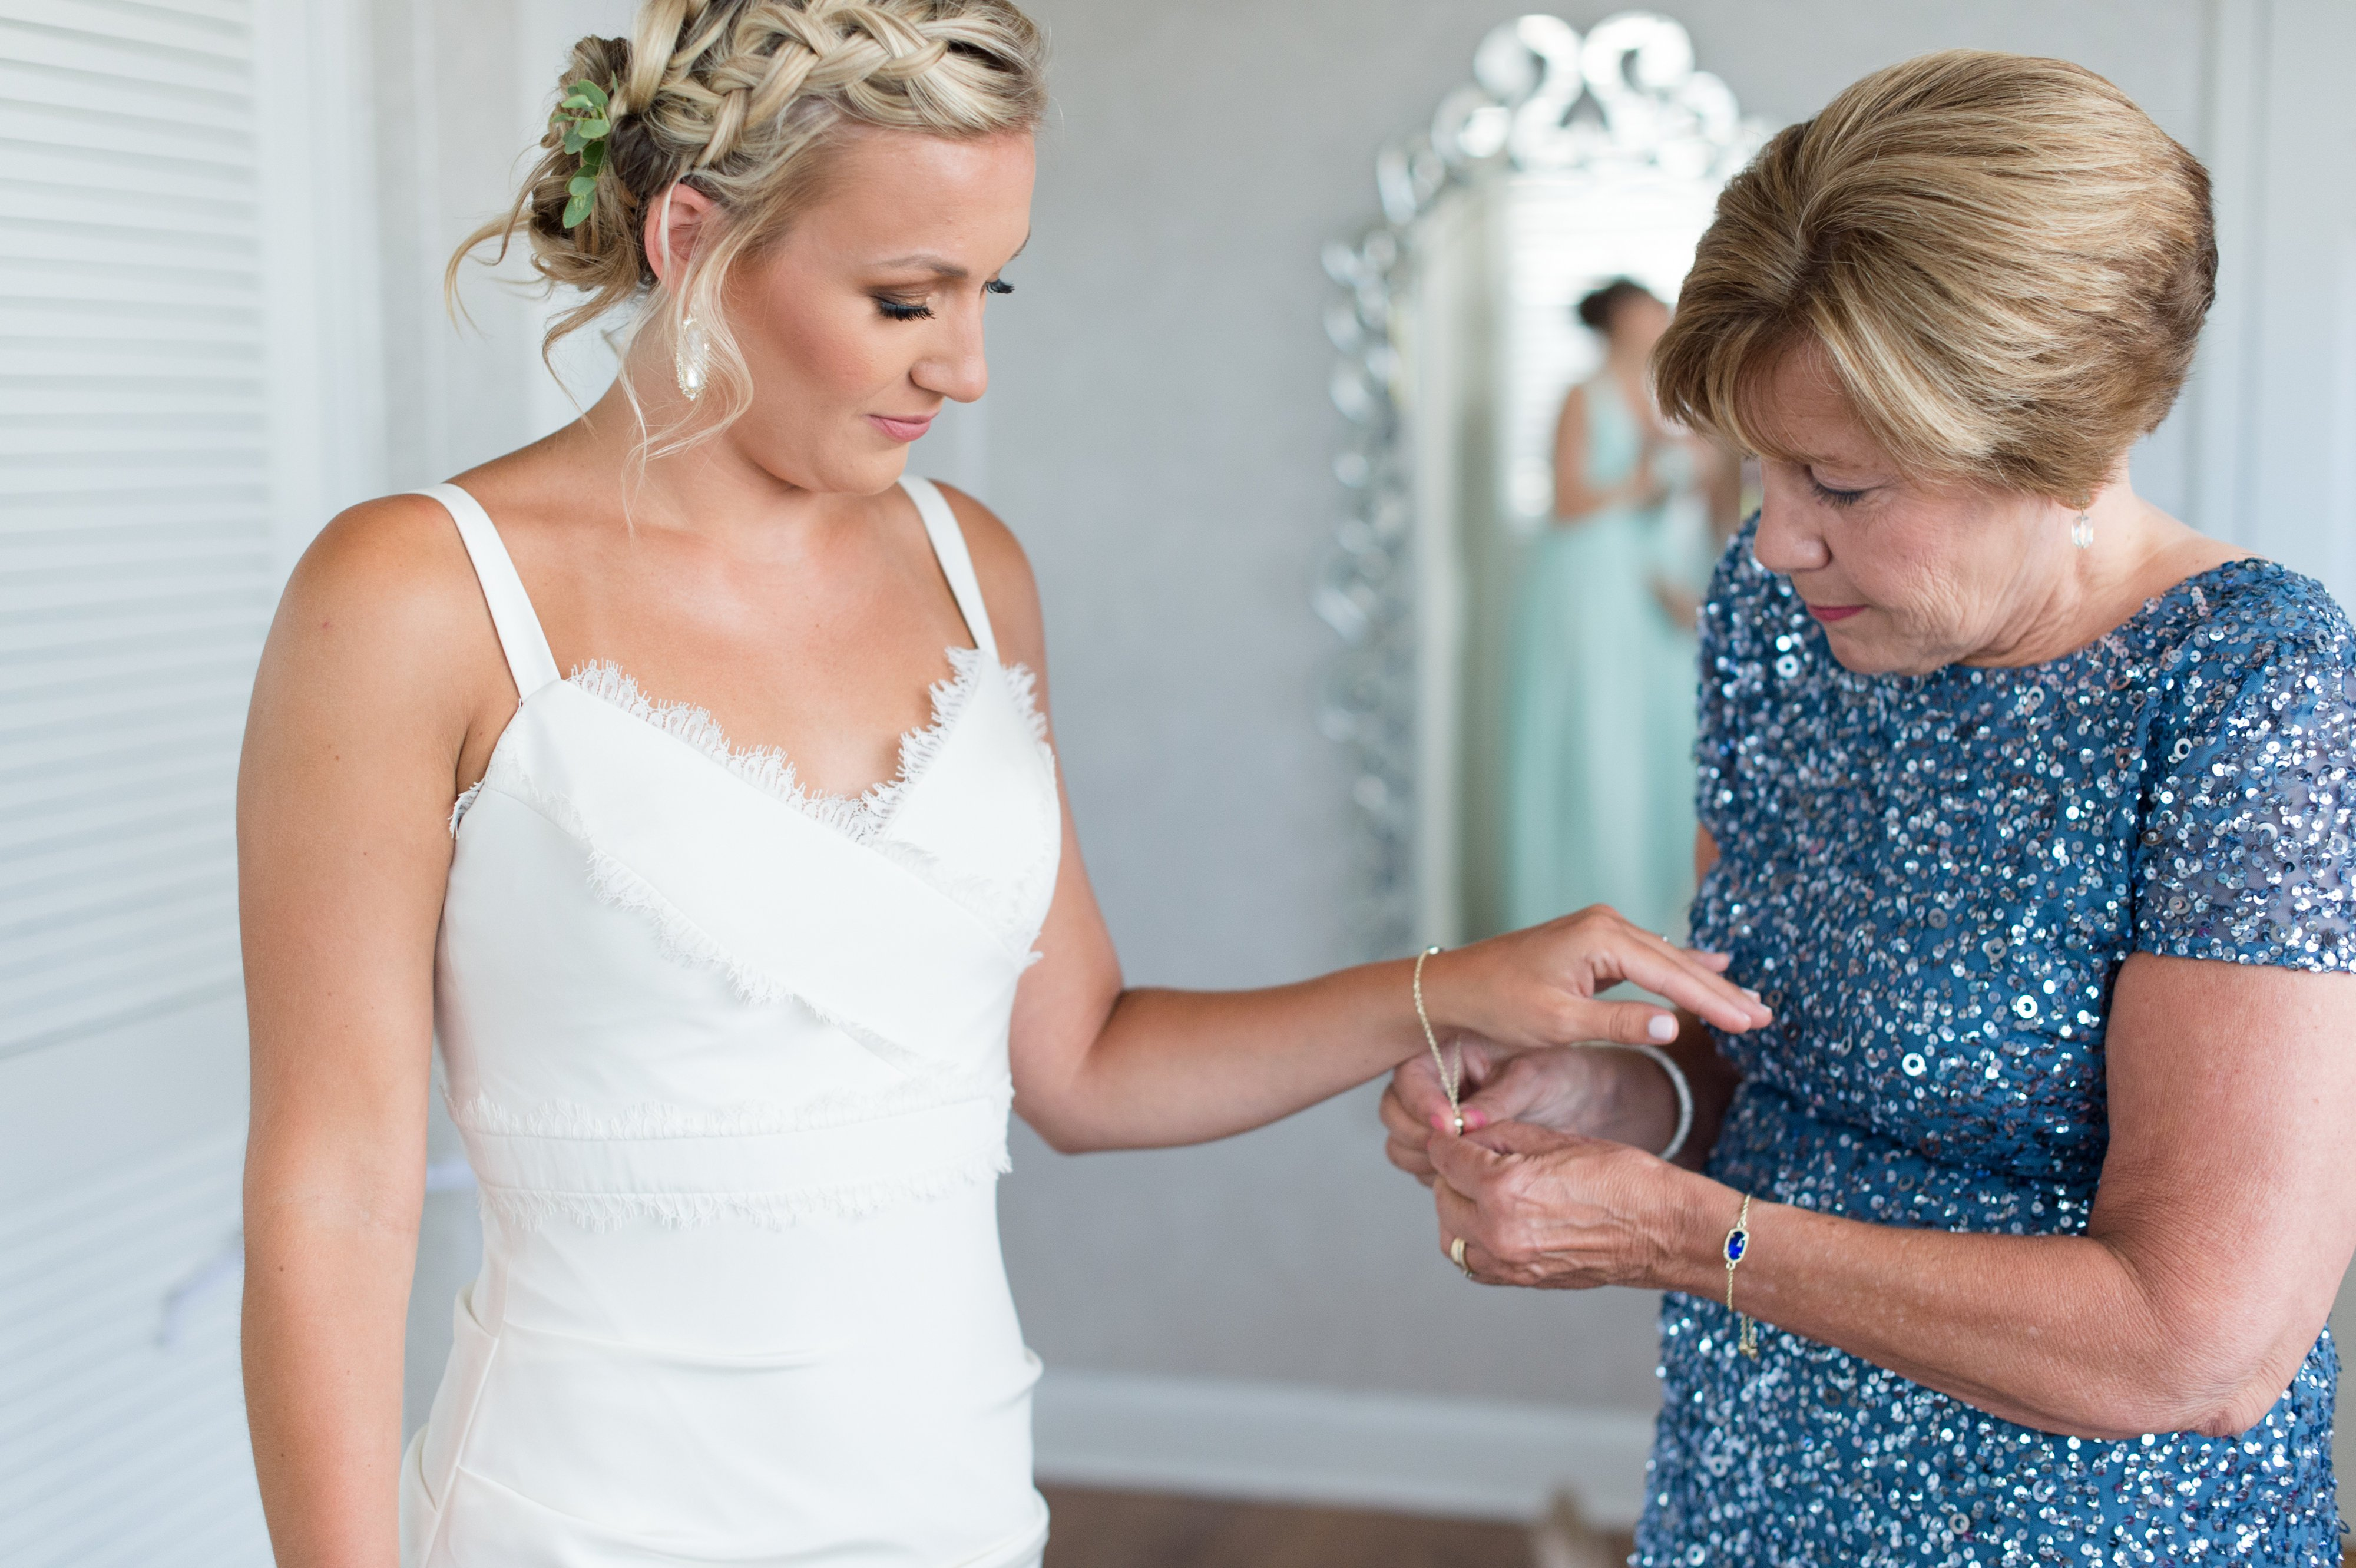 Best-Something-Borrowed-Bridal-Suite-Venue-Virginia-Beach-Lesner-Inn-Beth-Hamilton-Photography.jpg